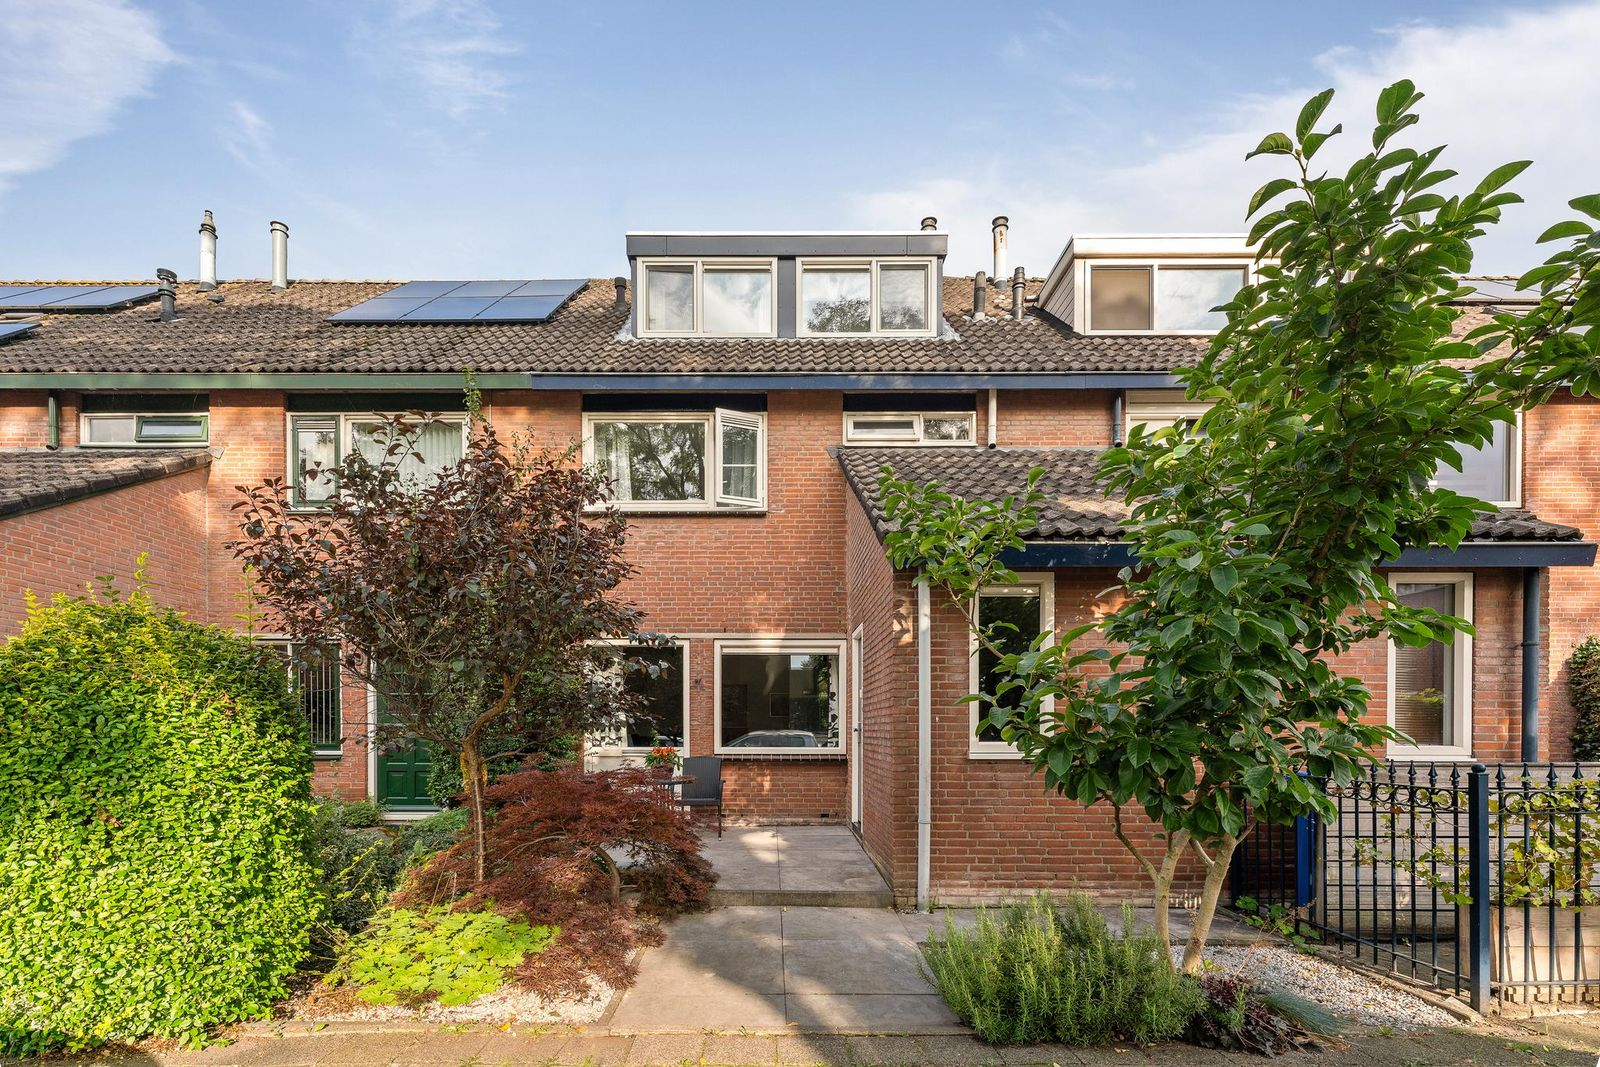 Bosbes 97, Rotterdam